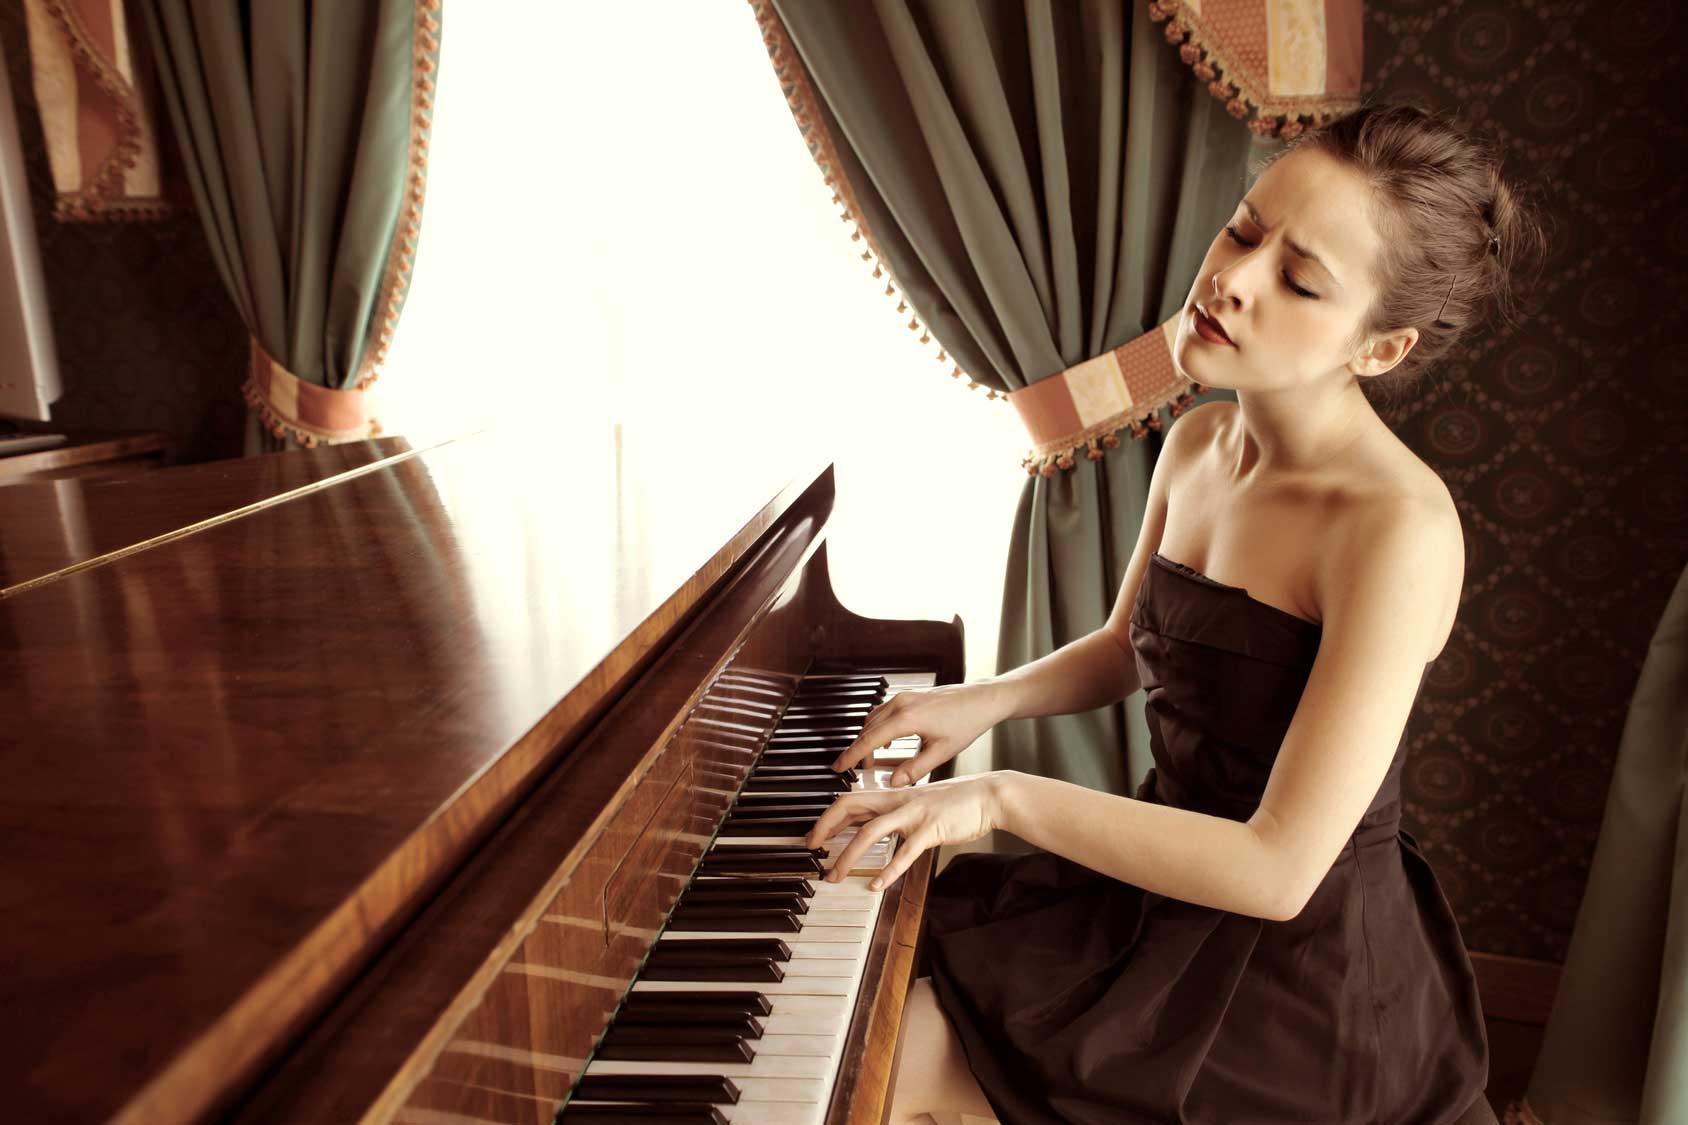 Classical music sad piano